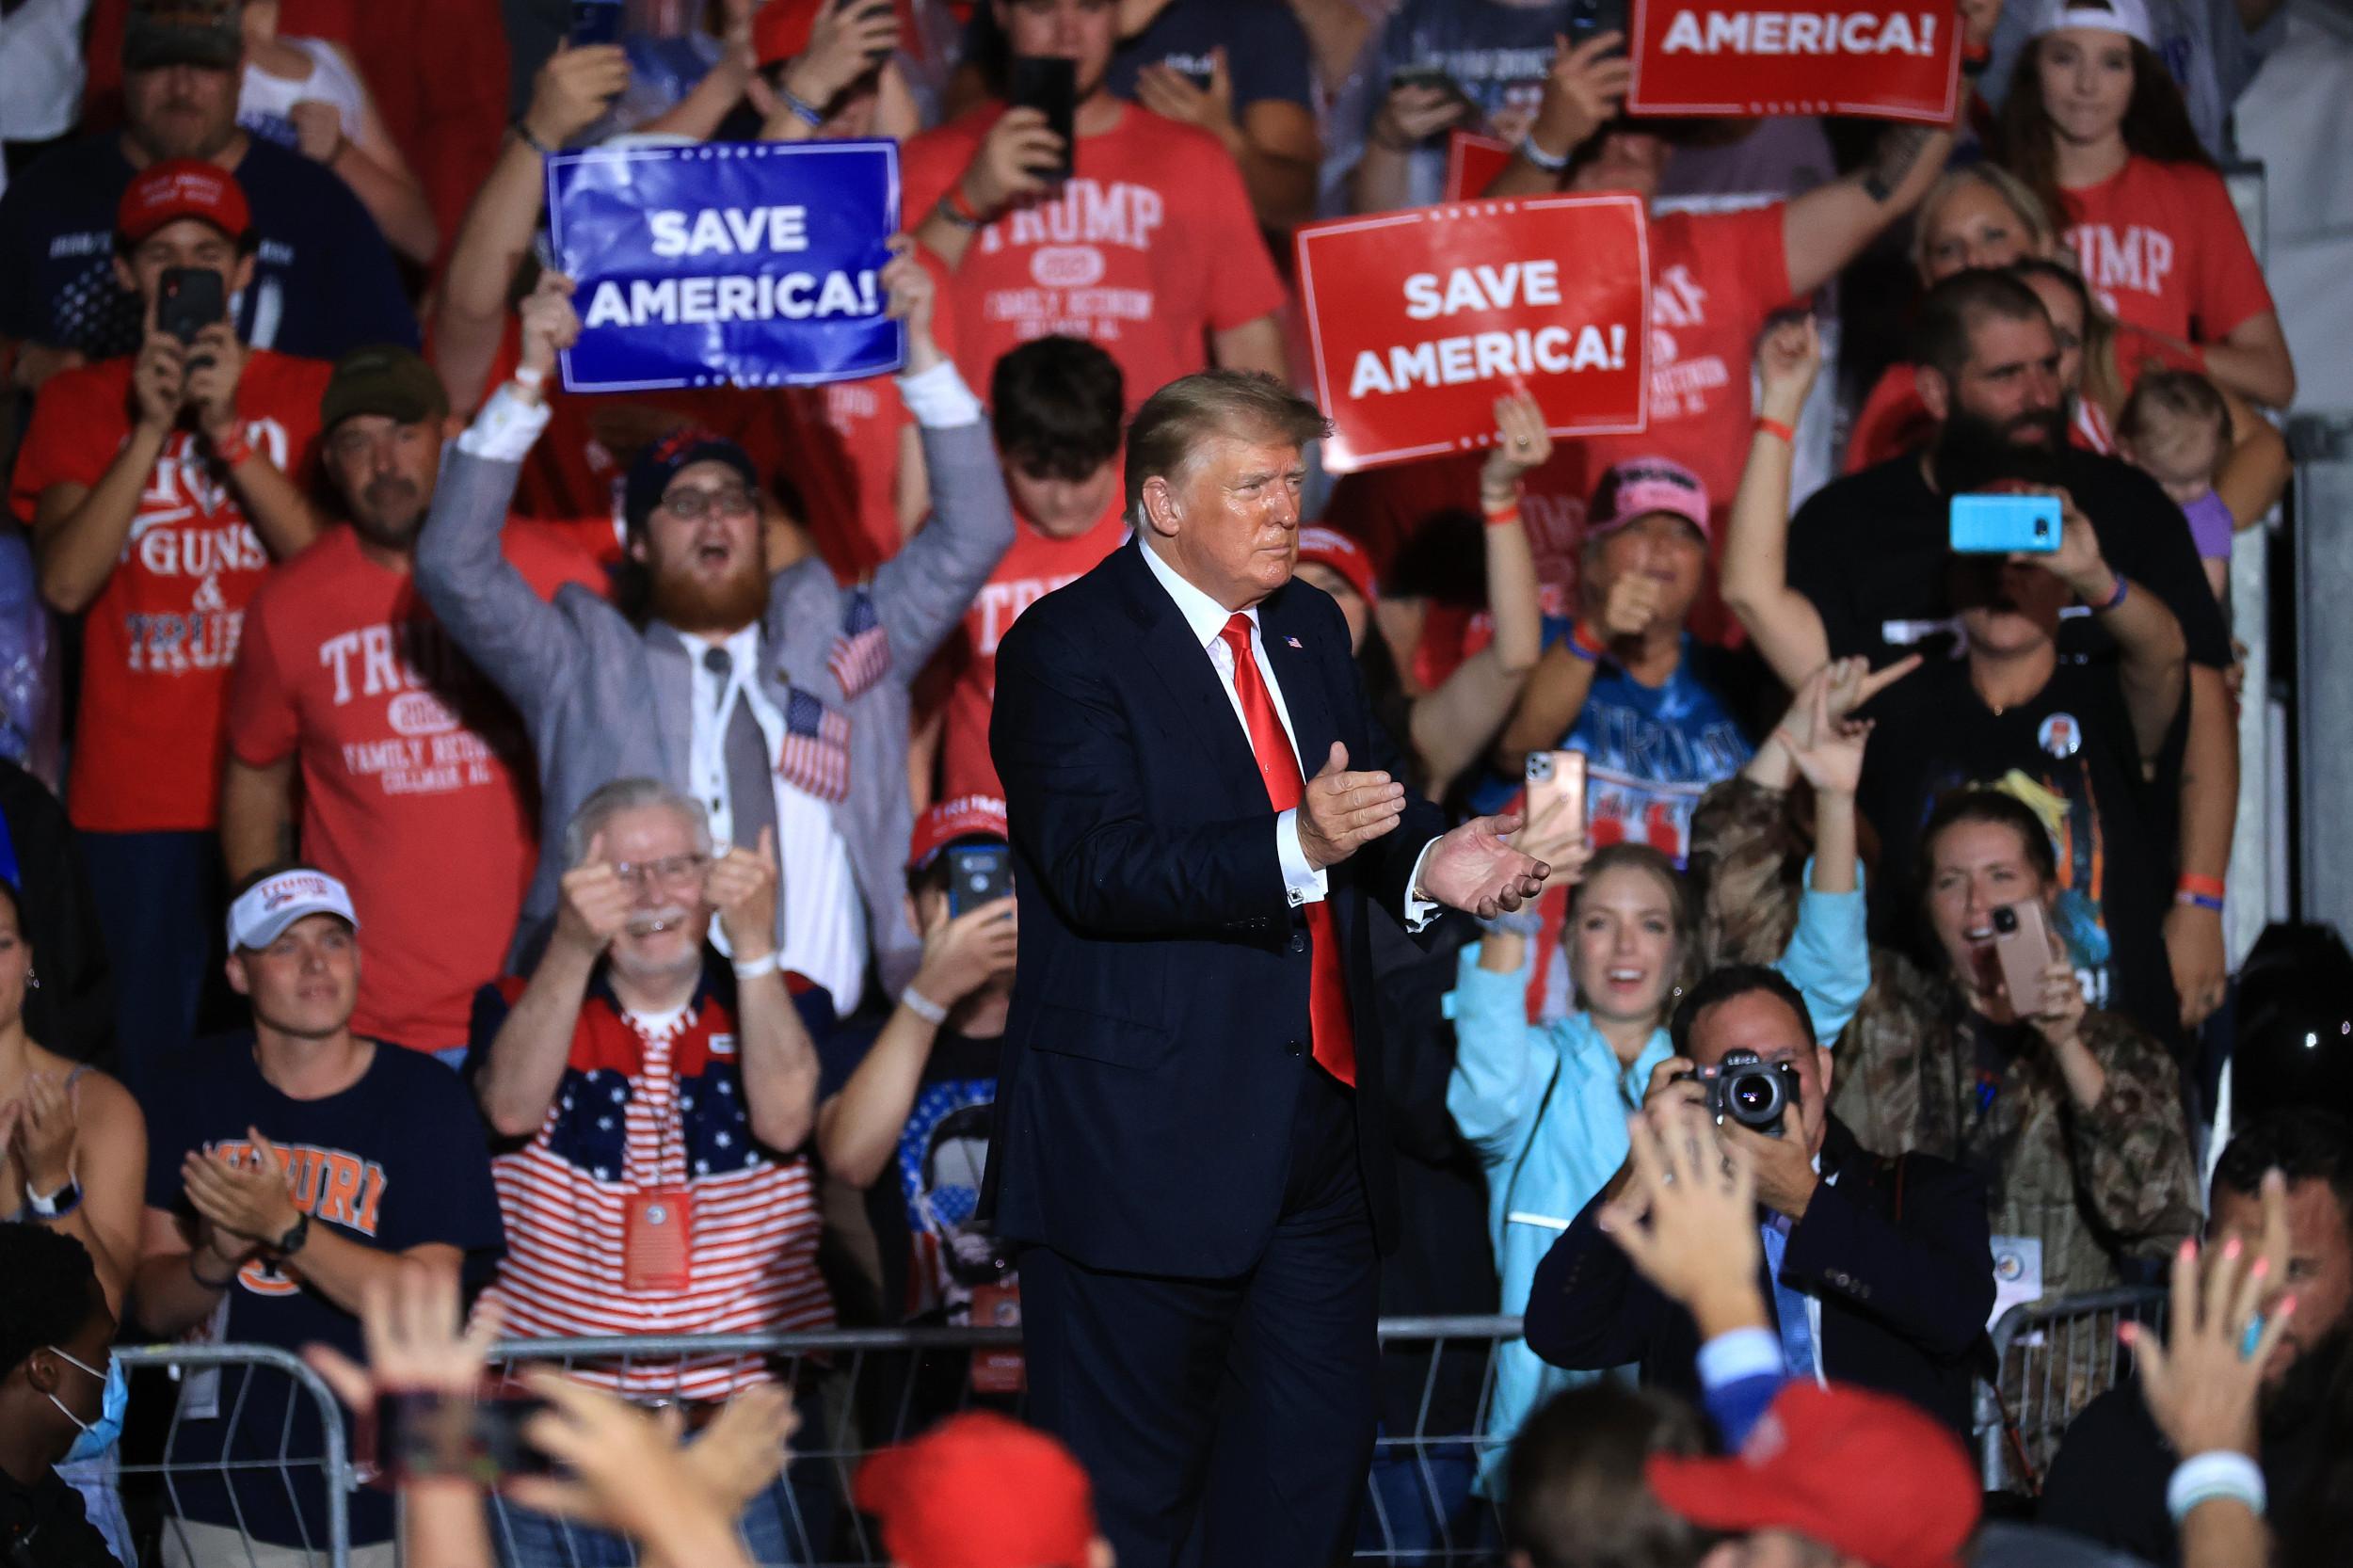 At Georgia Rally, Trump Falsely Claims Arizona Audit Found He Won in Maricopa County - Newsweek